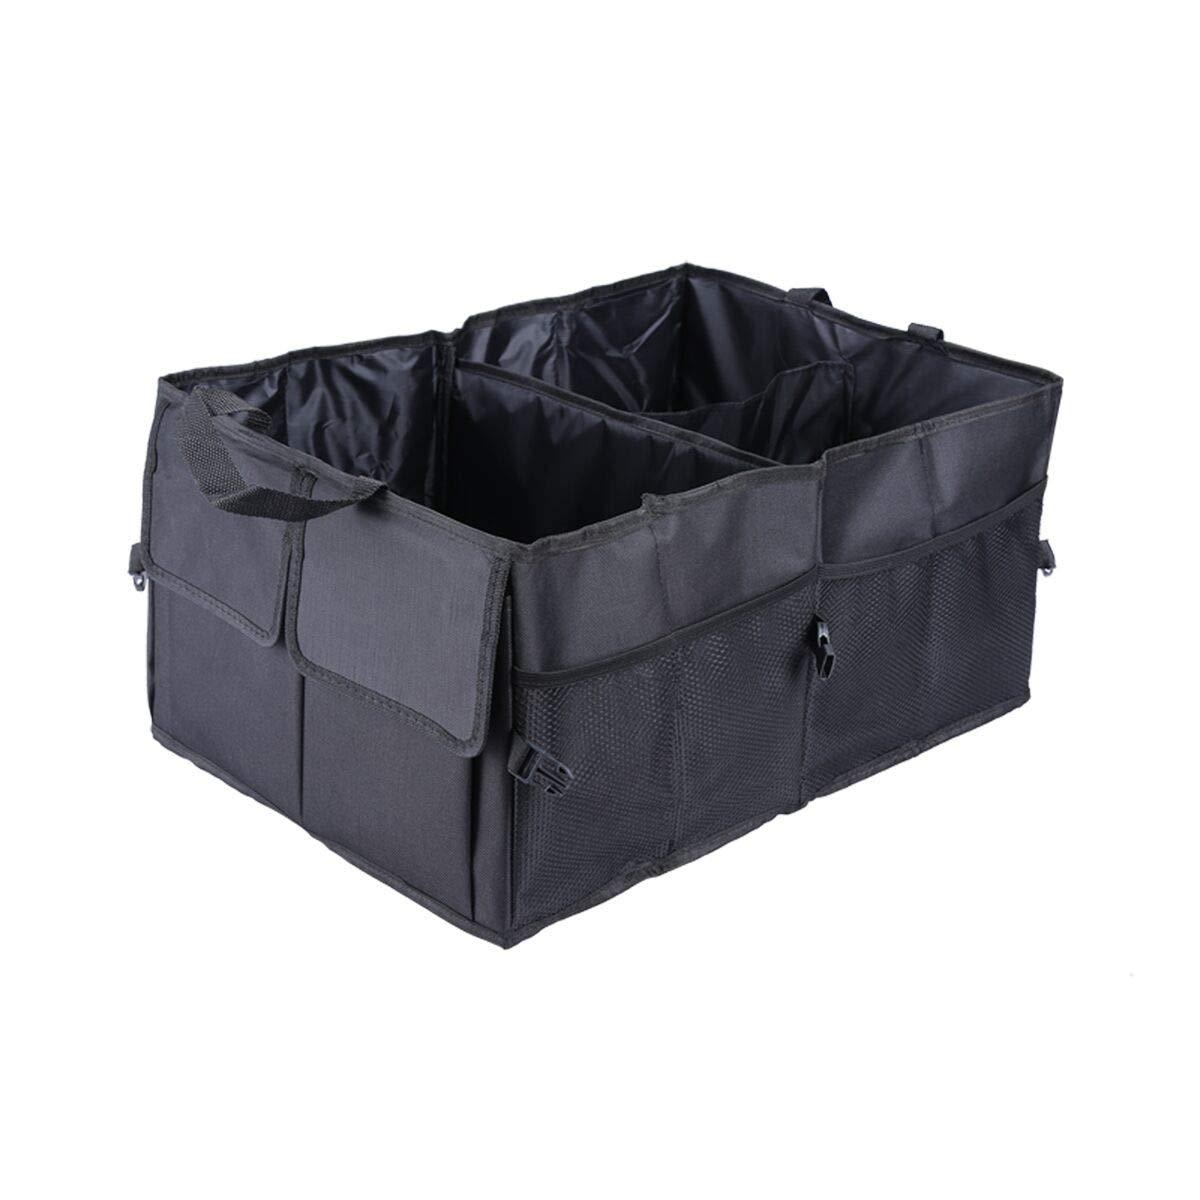 Trunk Organizer Foldable Car Storage Bag Collapsible Cargo Box Portable SUV